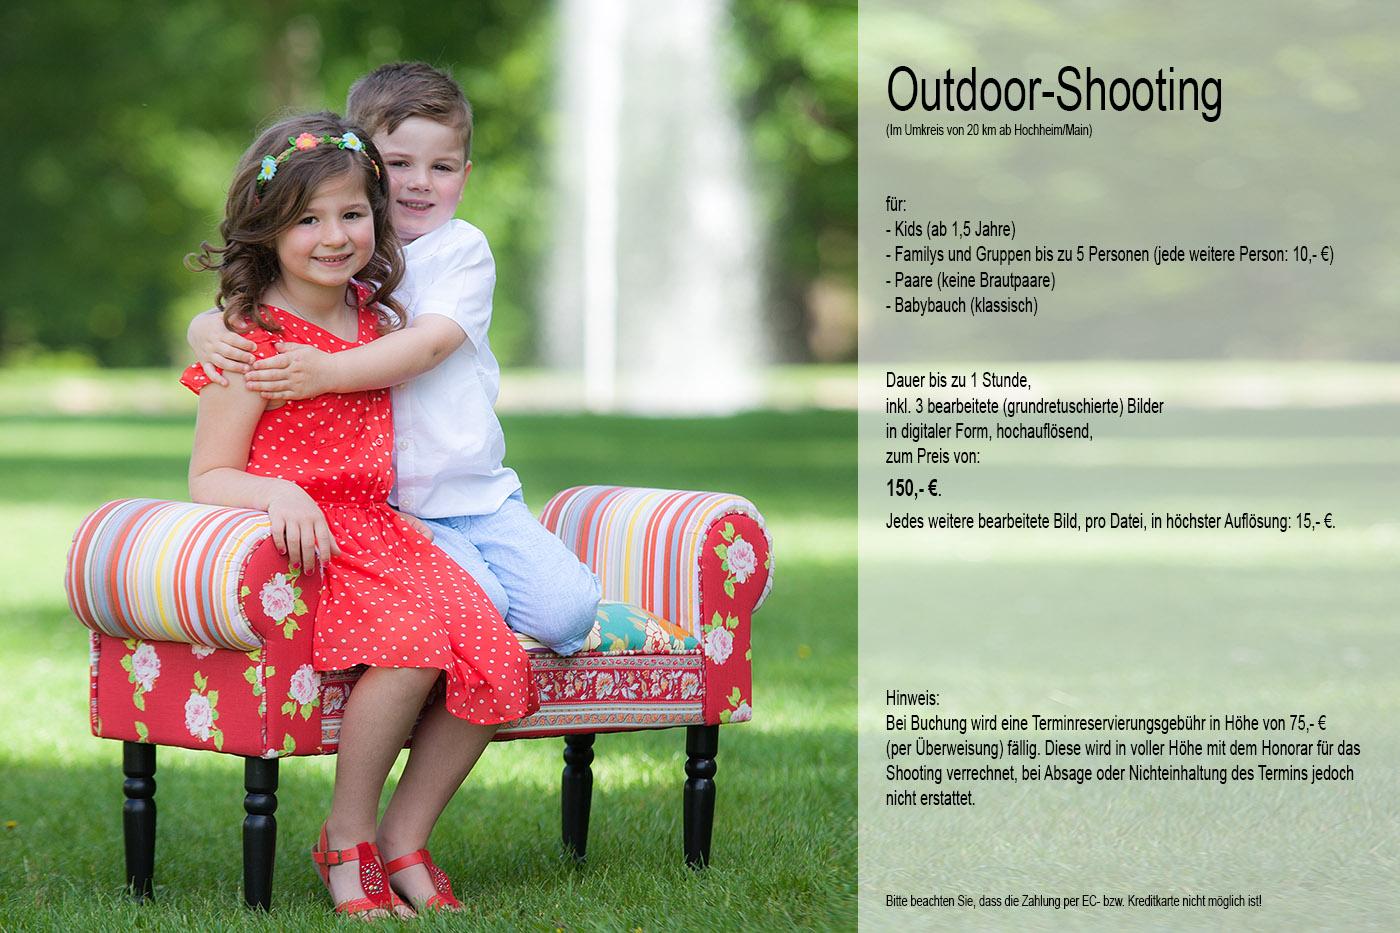 Outdoor-Shooting-Angebot-neu